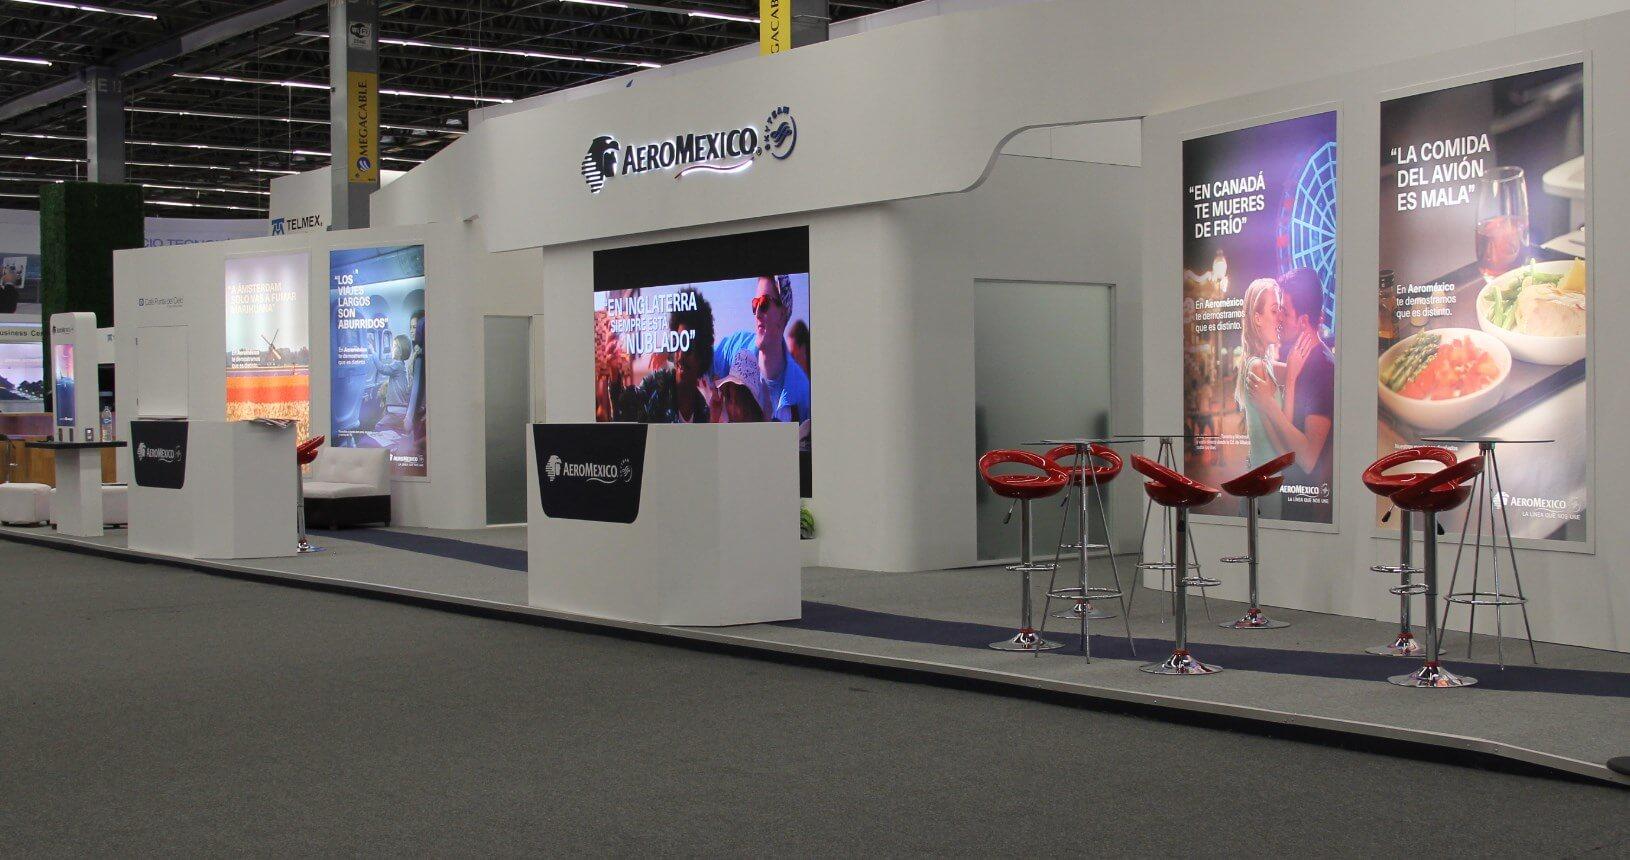 Stand AeroMéxico Proyed Soluciones